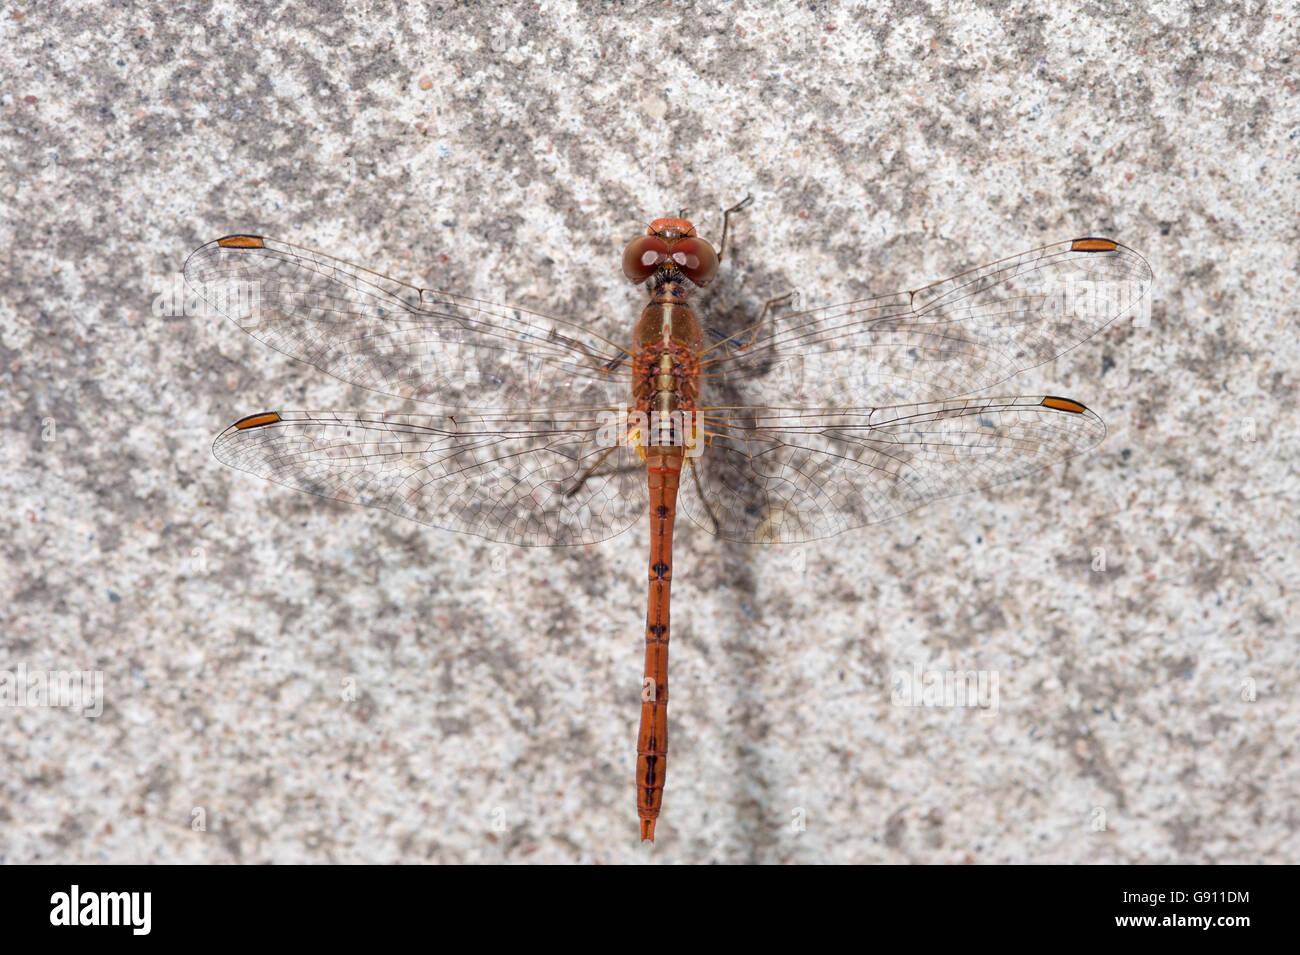 Eastern hawk dragonfly (Austrocordulia refracta) resting on concrete - Stock Image